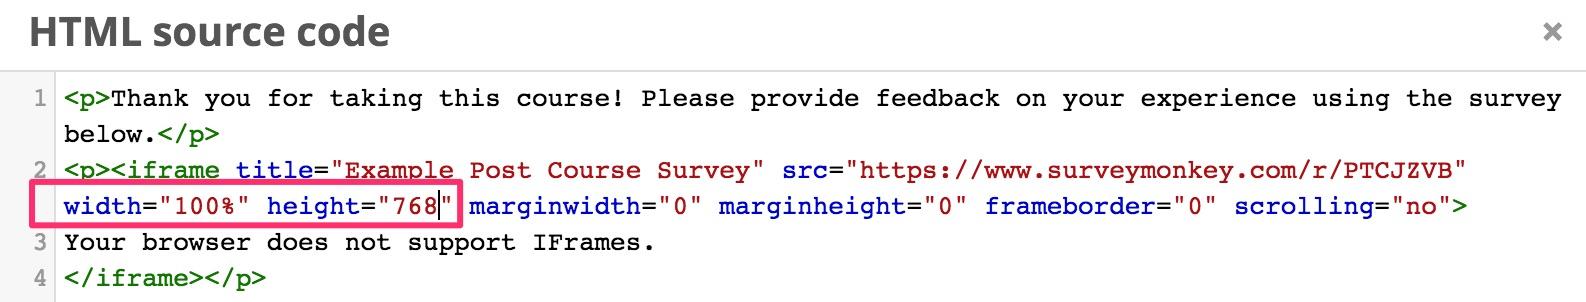 Adding a SurveyMonkey survey to your Open edX course - Appsembler